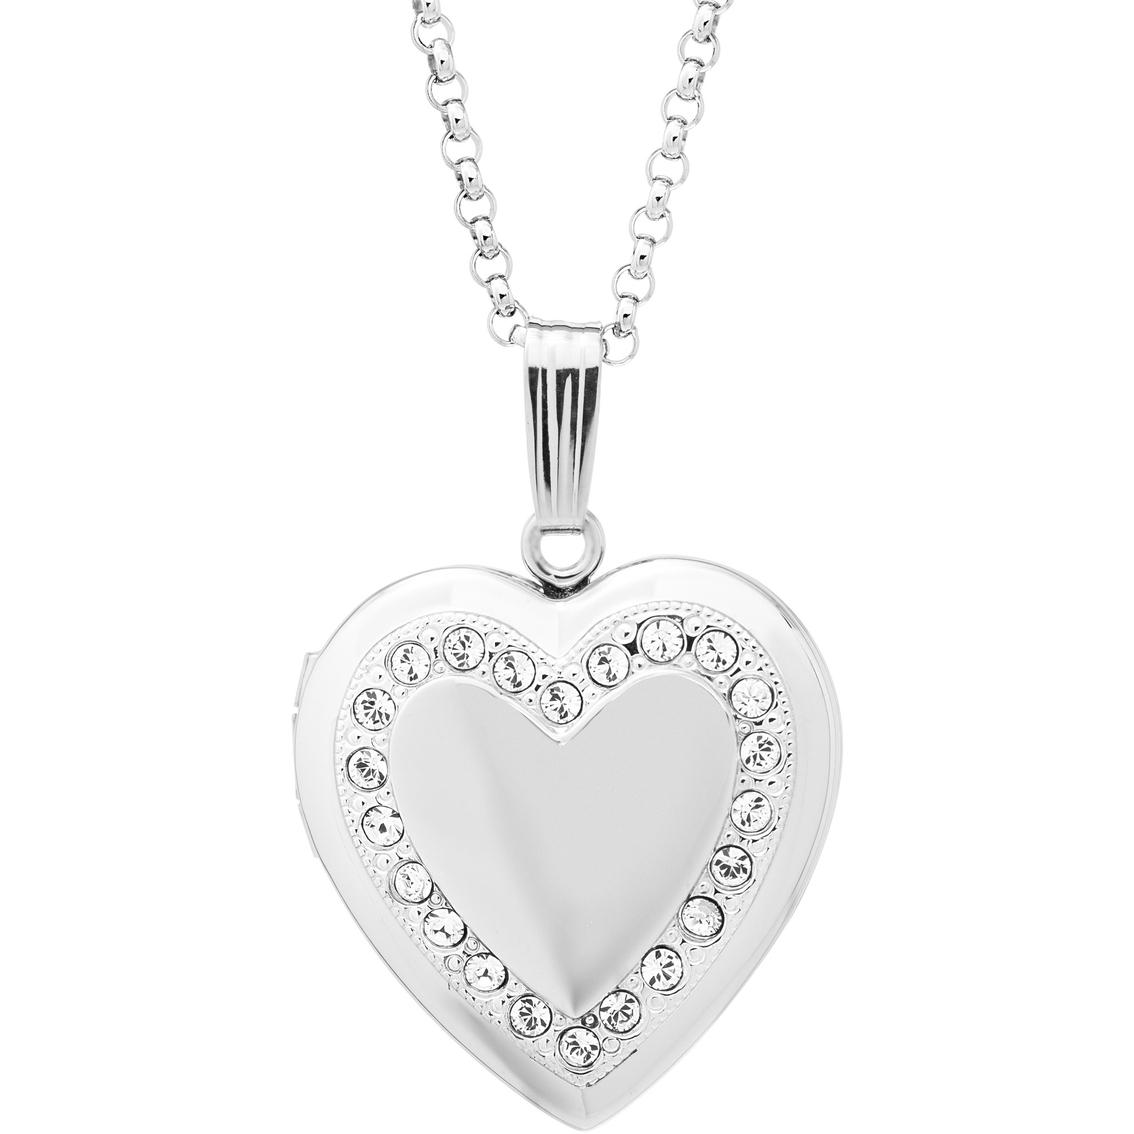 1134x1134 Drawn Necklace Heart Shape